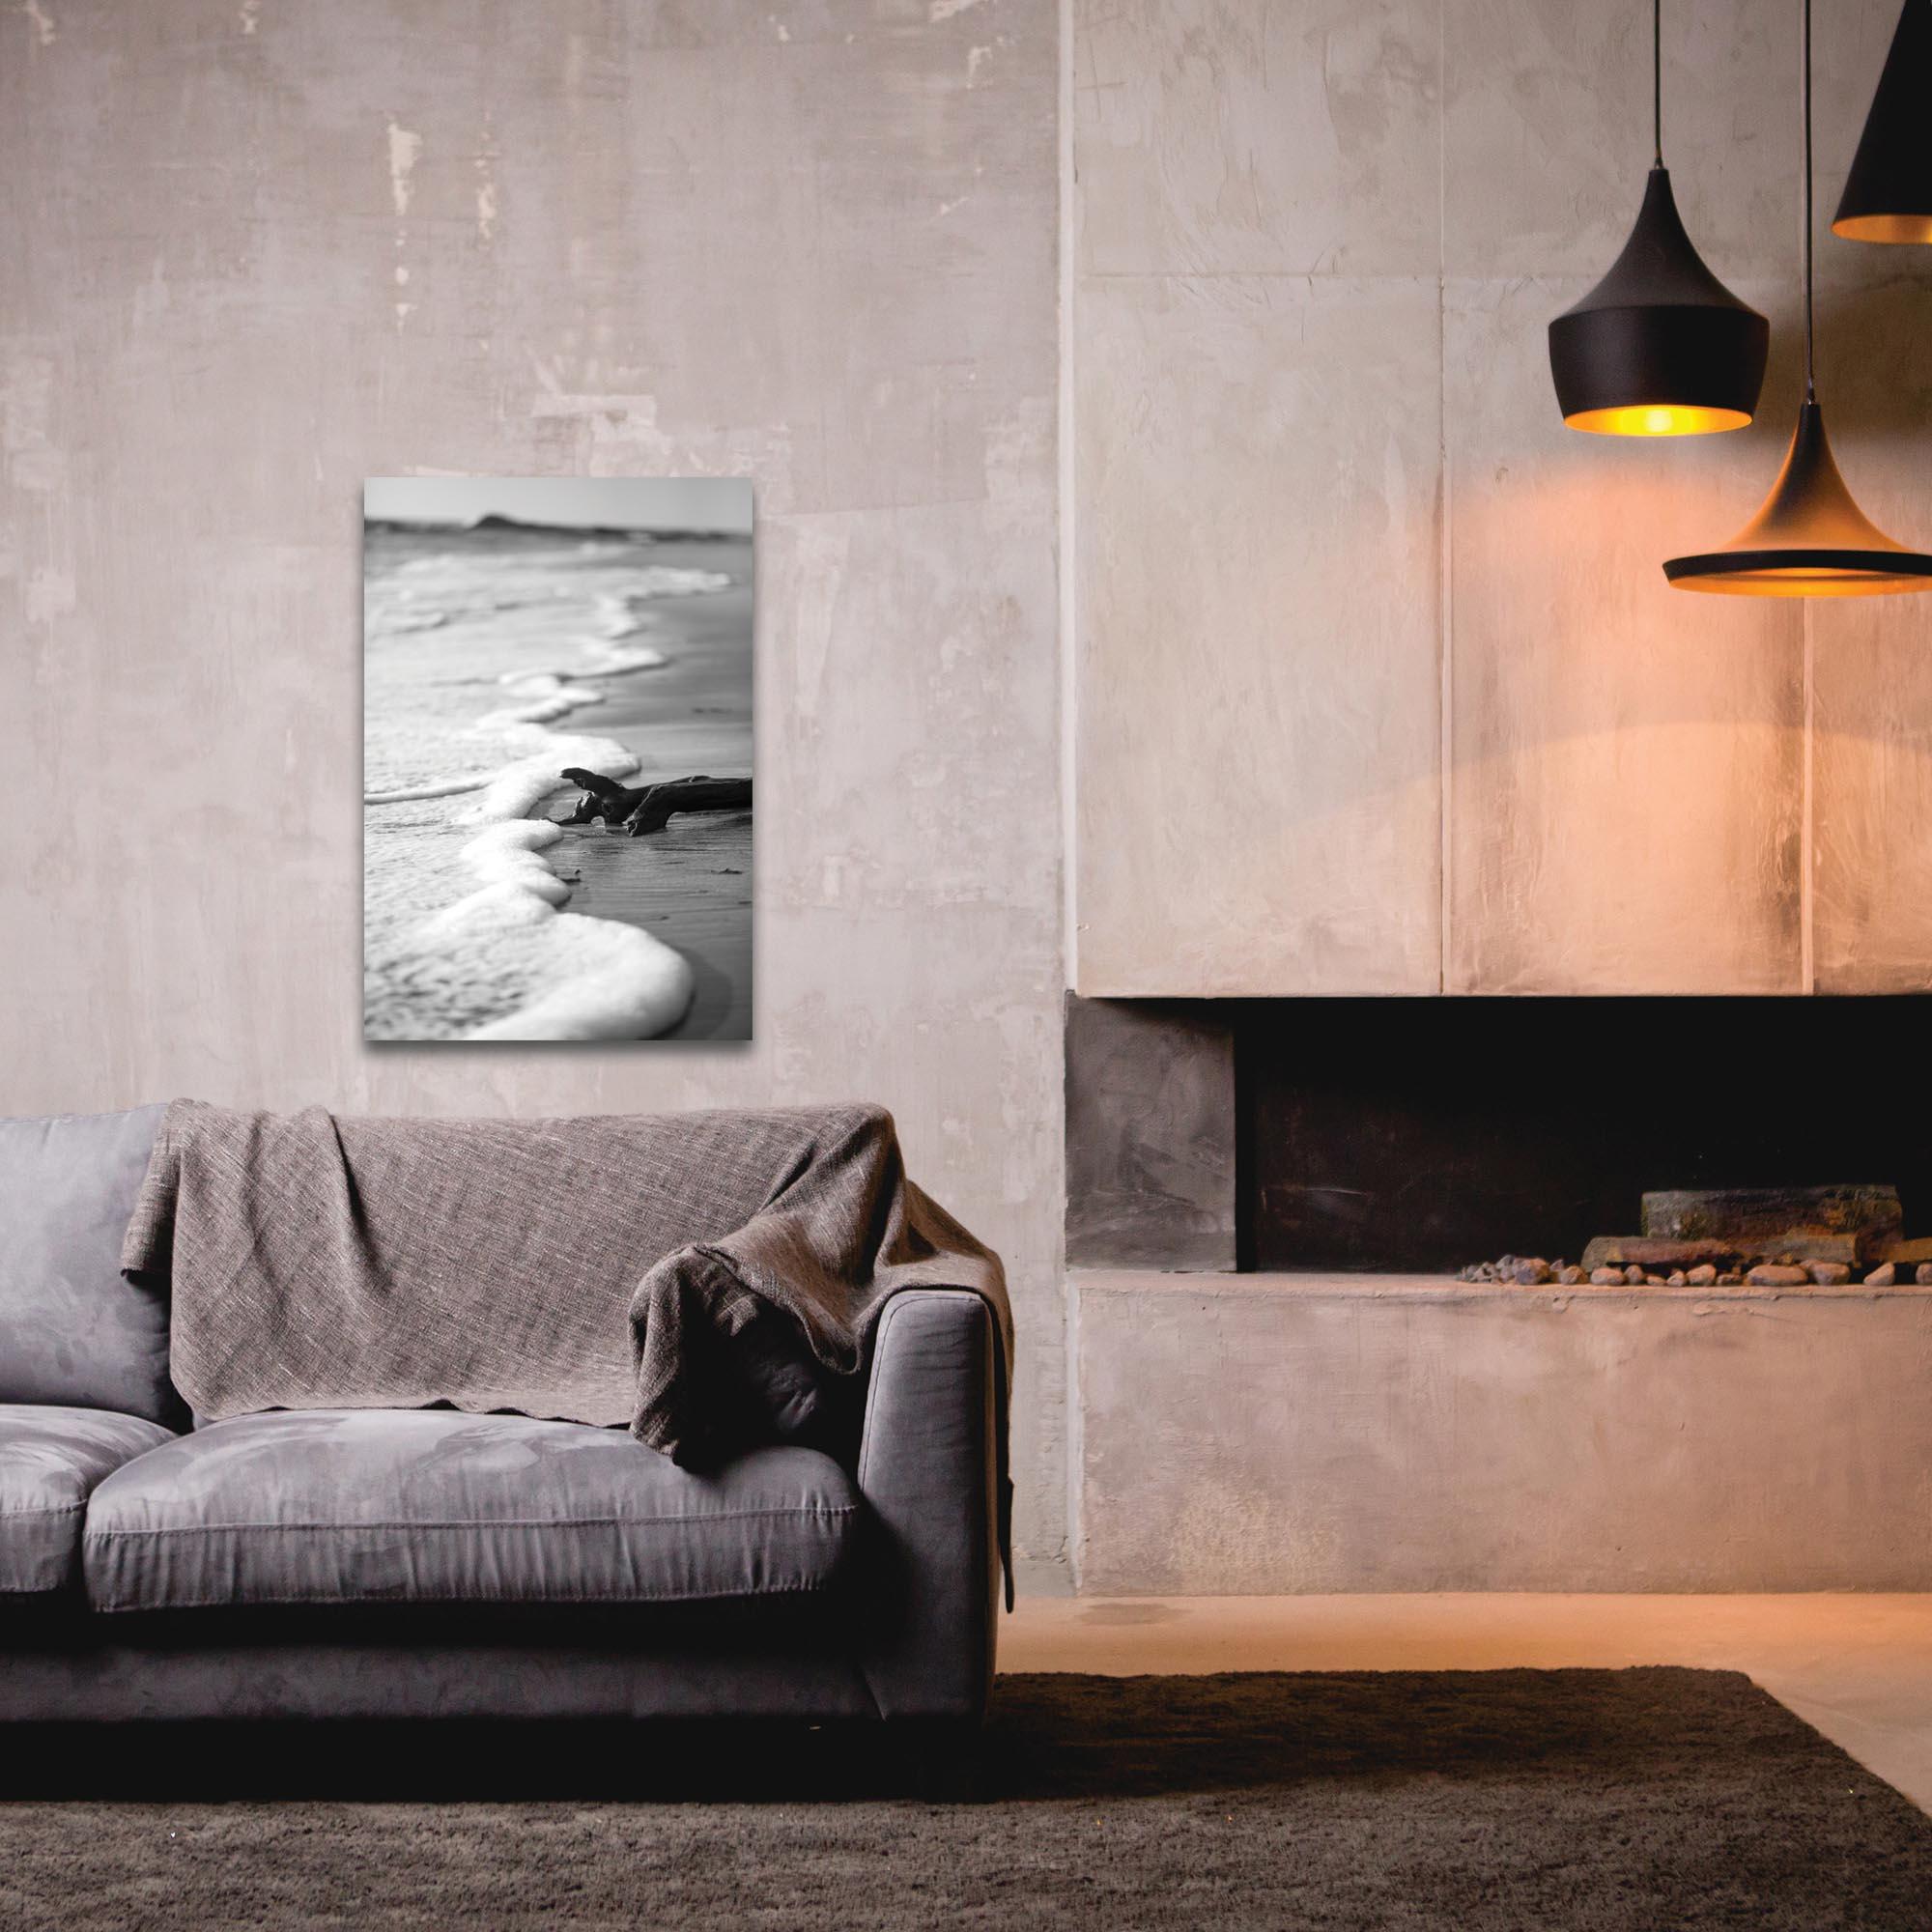 Film Noir Wall Art 'Foaming Sea' - Coastal Decor on Metal or Plexiglass - Lifestyle View